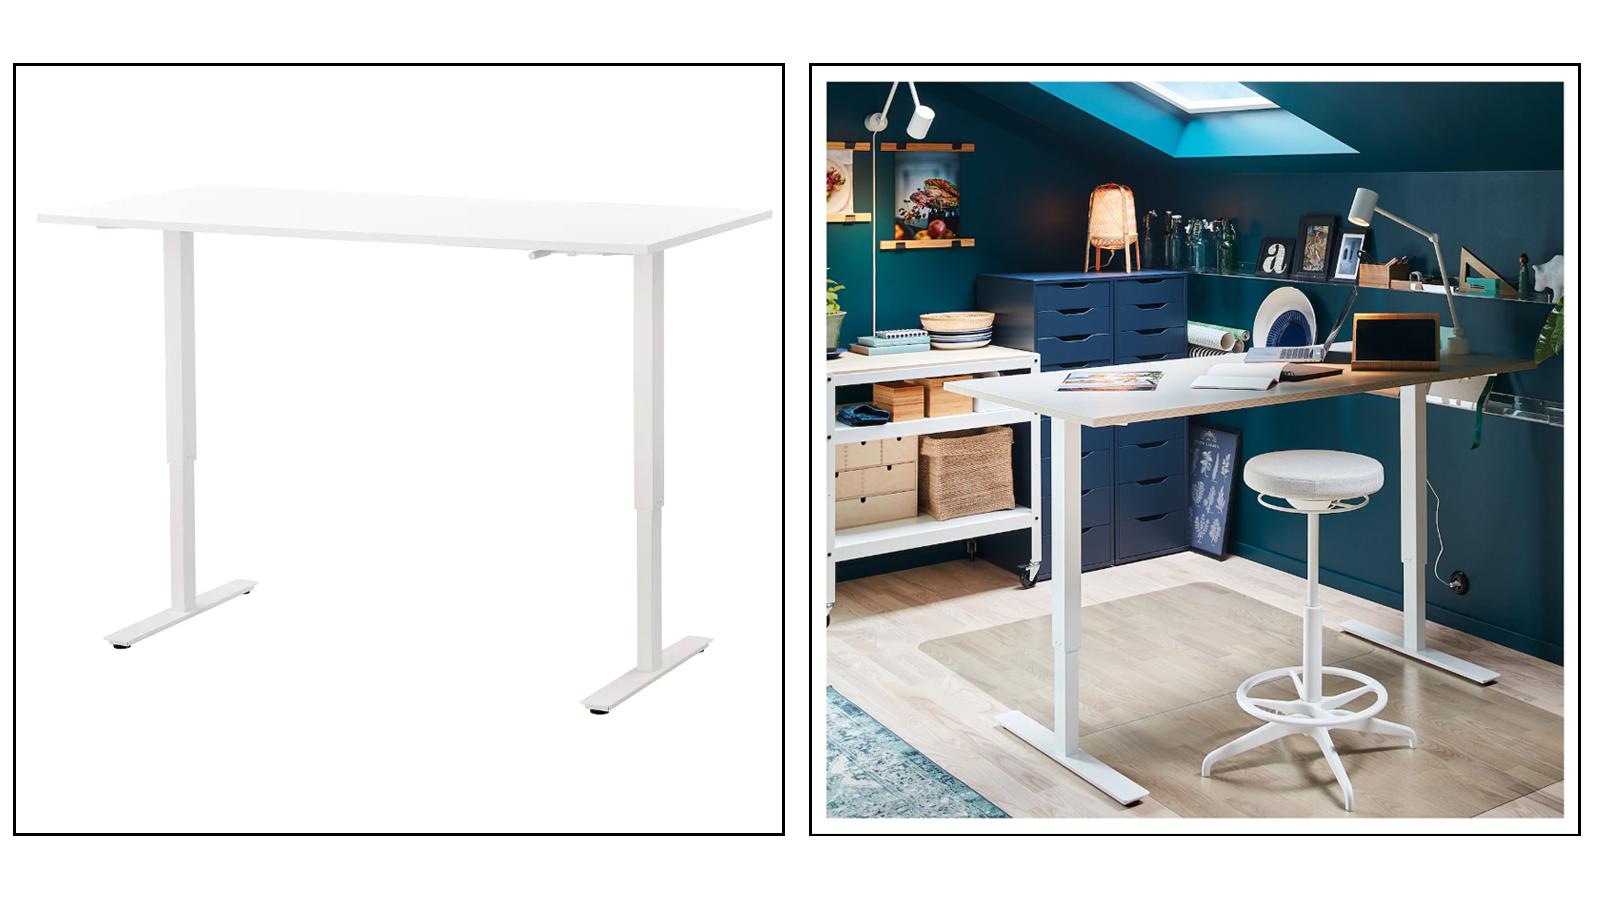 Ikea Skarsta manual crank standing desk with cable management